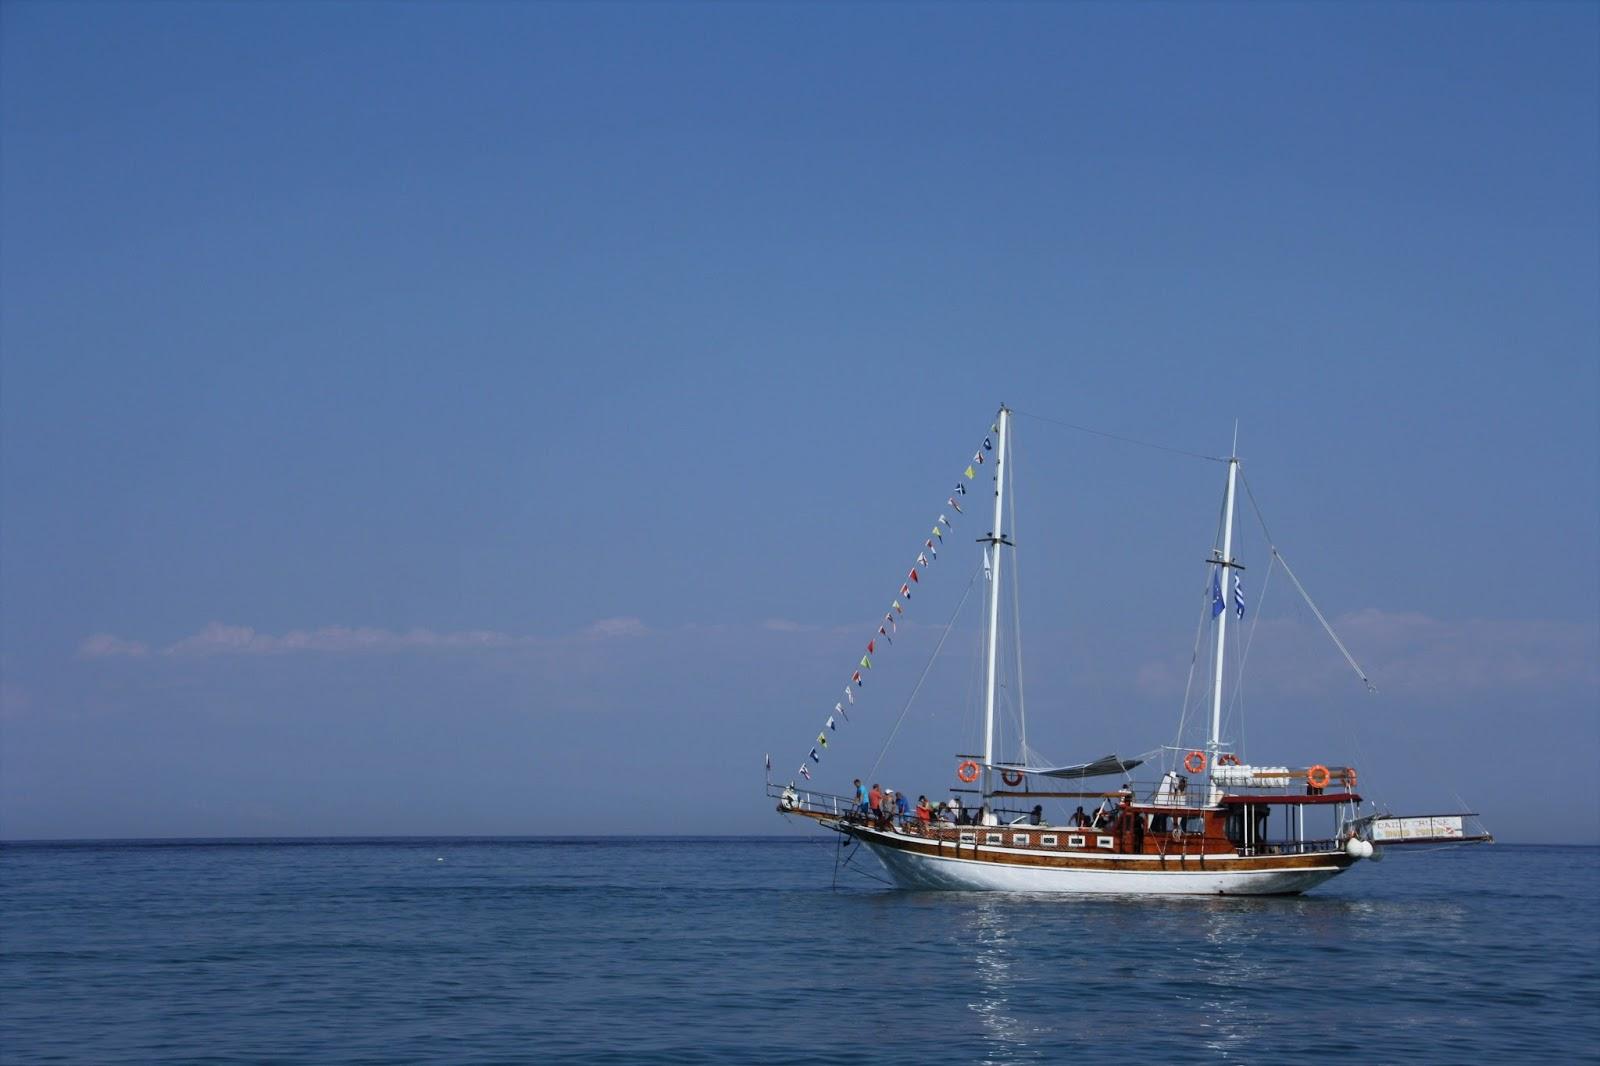 Boottochtje Argo Kefalonia